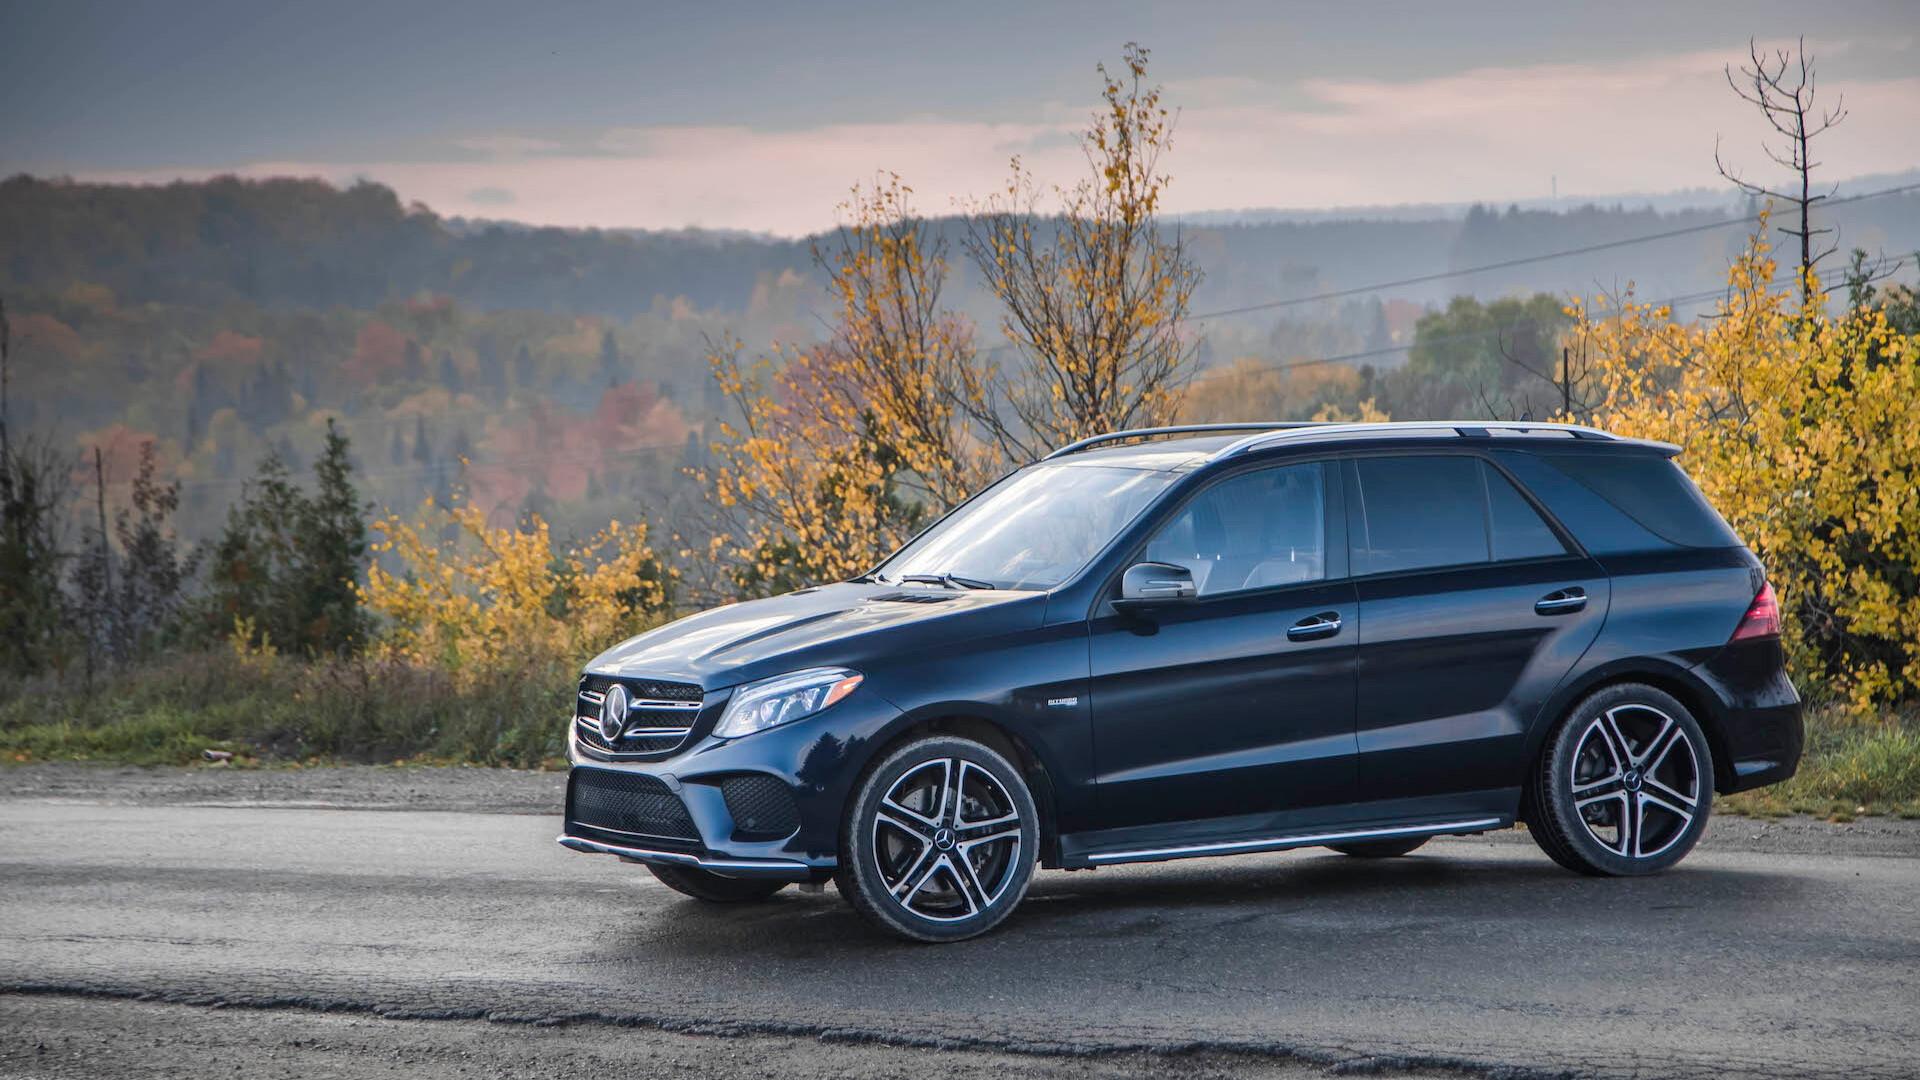 2018 Mercedes-Benz GLE-Class (Mercedes-AMG GLE43 SUV)